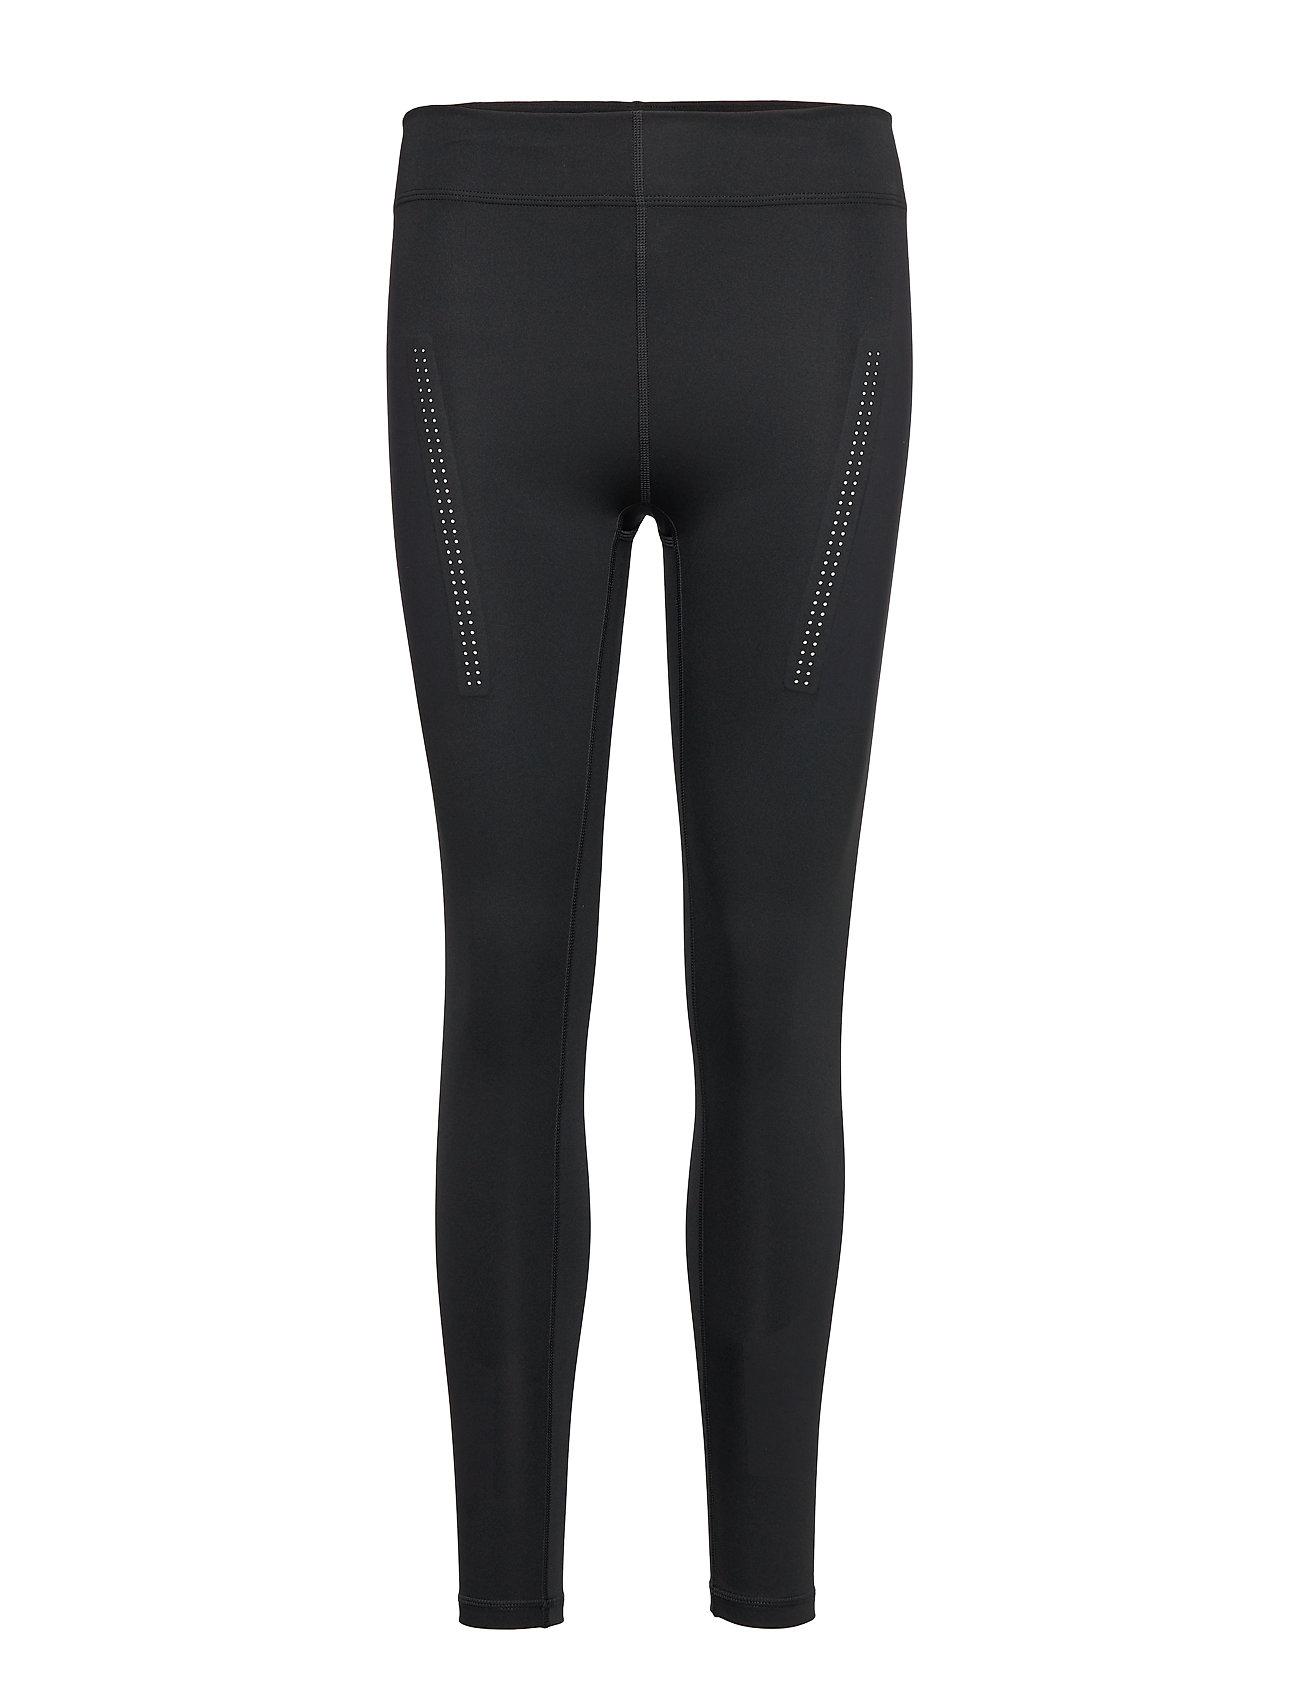 adidas by Stella McCartney FITSENSE TIGHT - BLACK